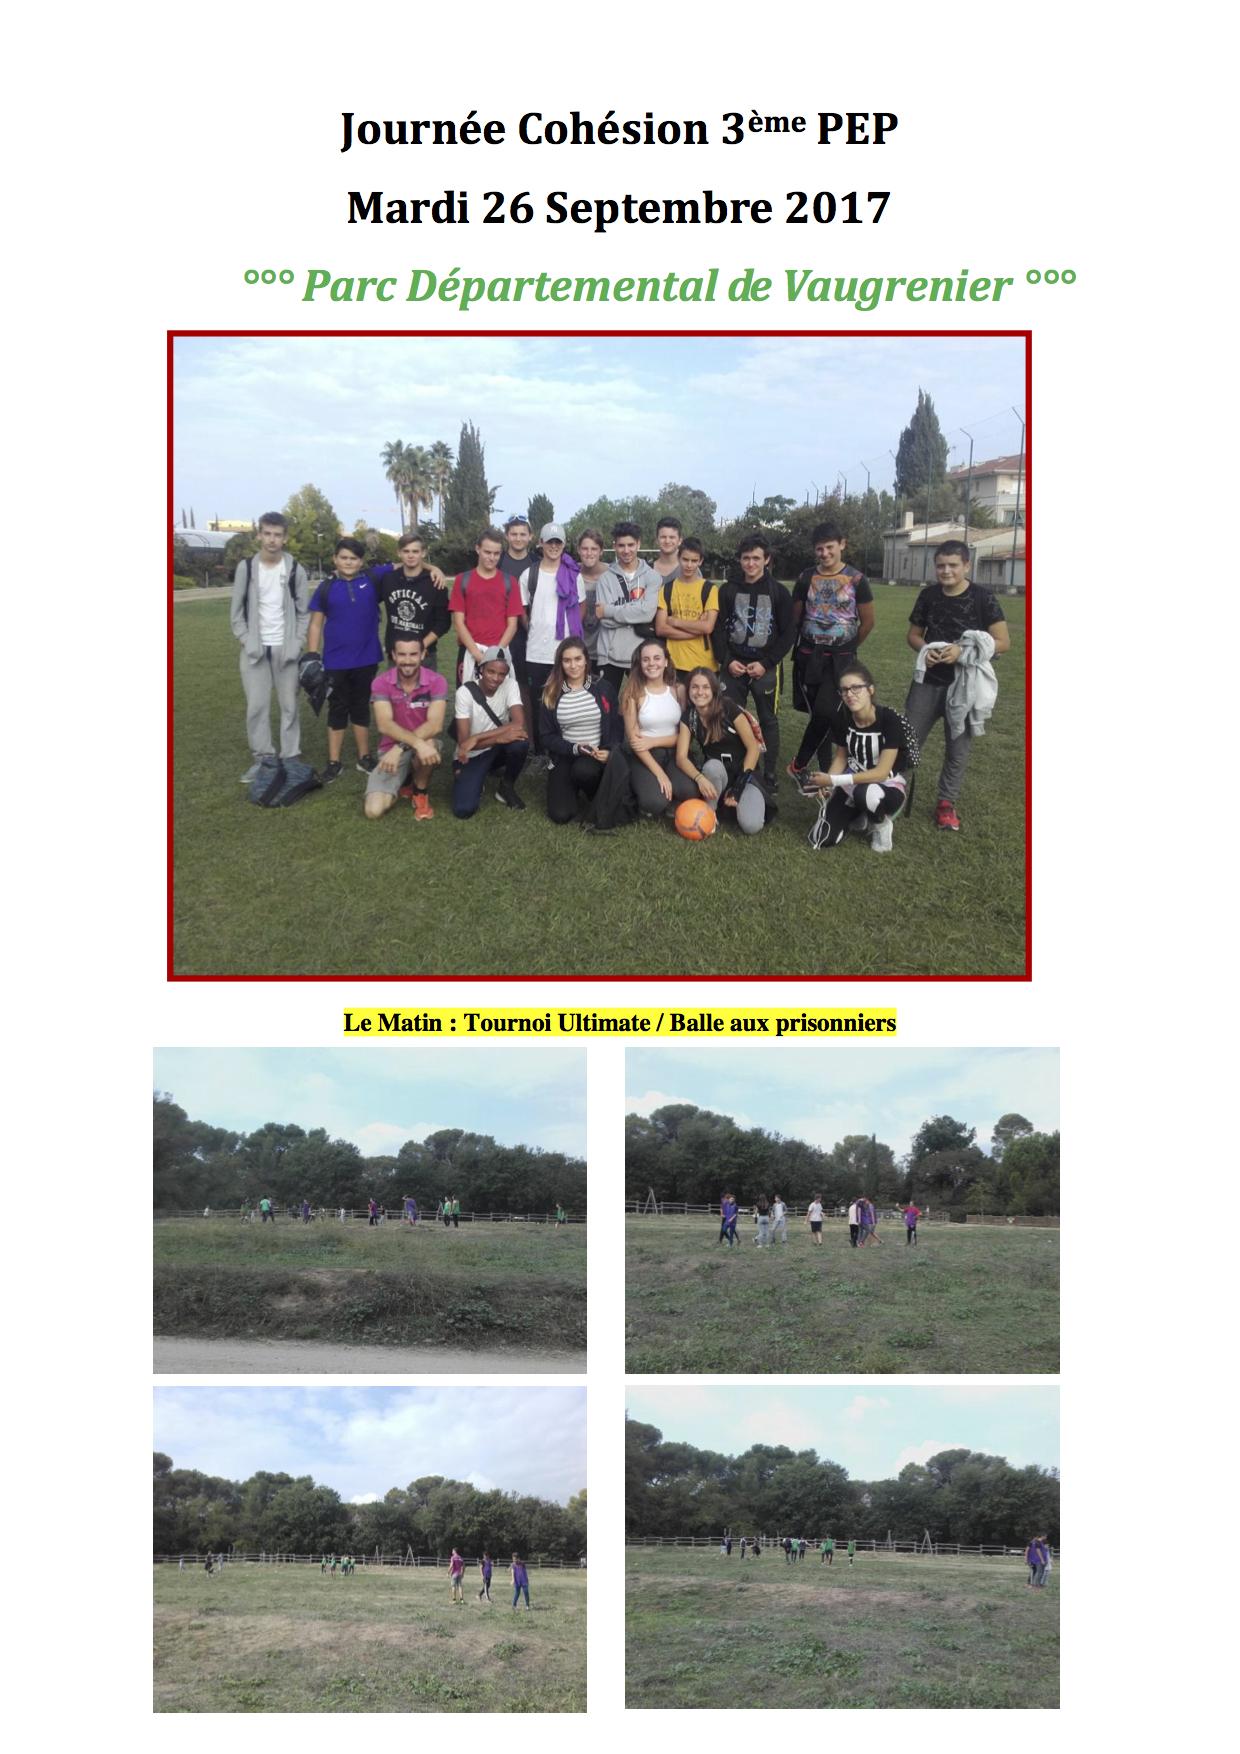 image Montage_Journee_Cohesion__3eme_PEP.jpg (1.4MB)